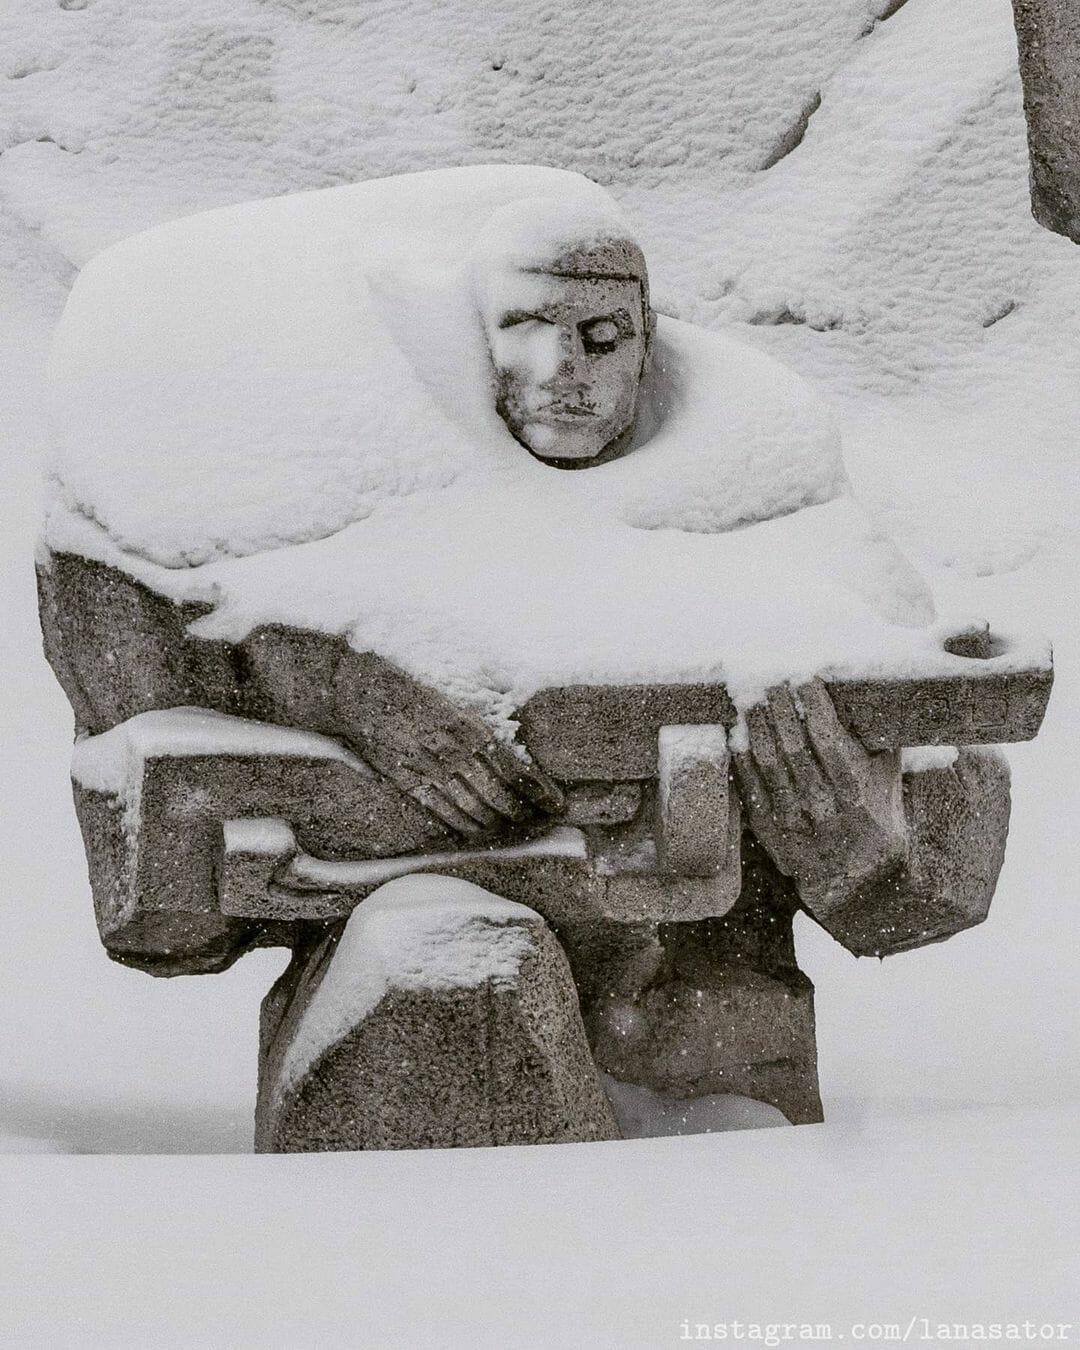 statue neige lana Sator